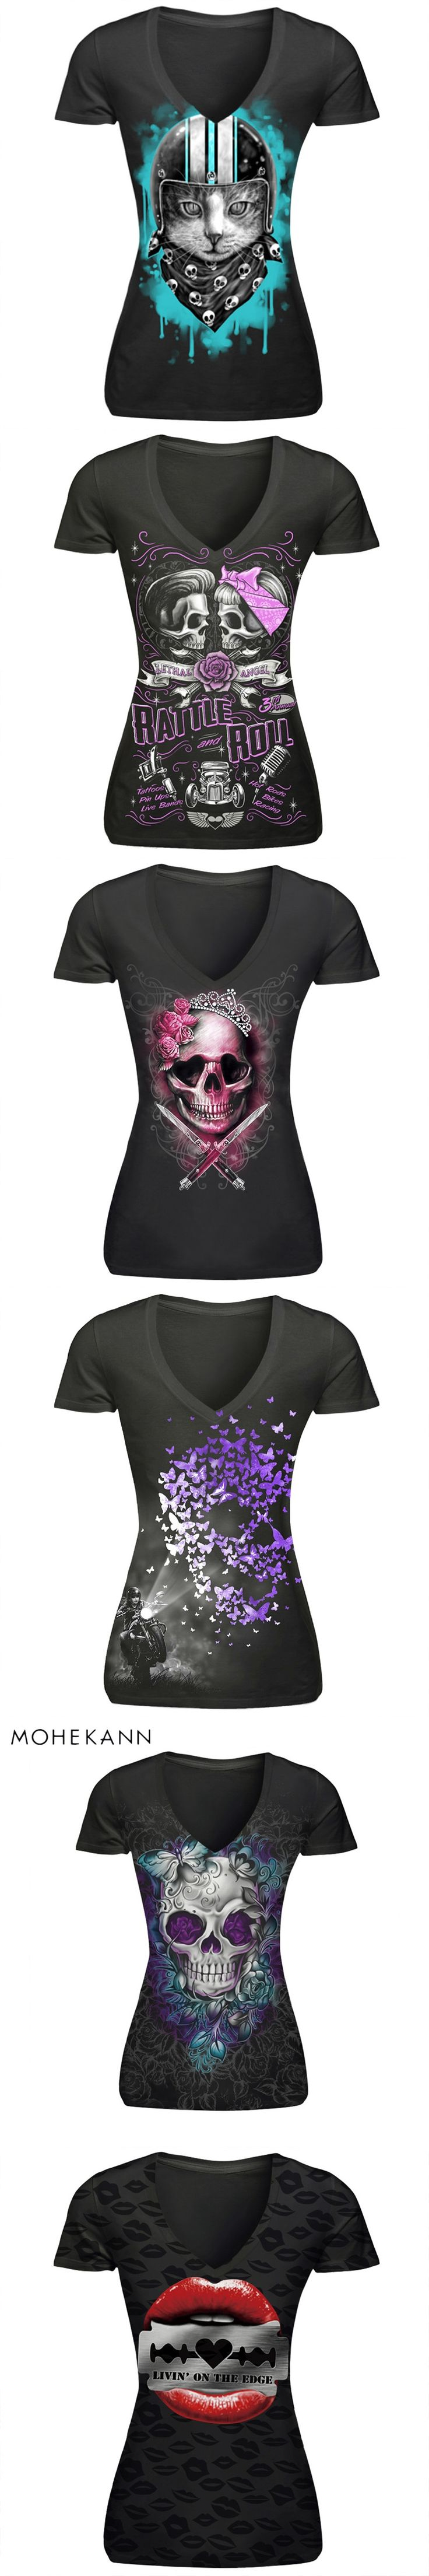 2017 Mohekann T-shirts Harajuku Women Sexy Club Punk Style T shirts Summer 3D Print Skull Rose Tops Casual V-Neck Tees Camiseta